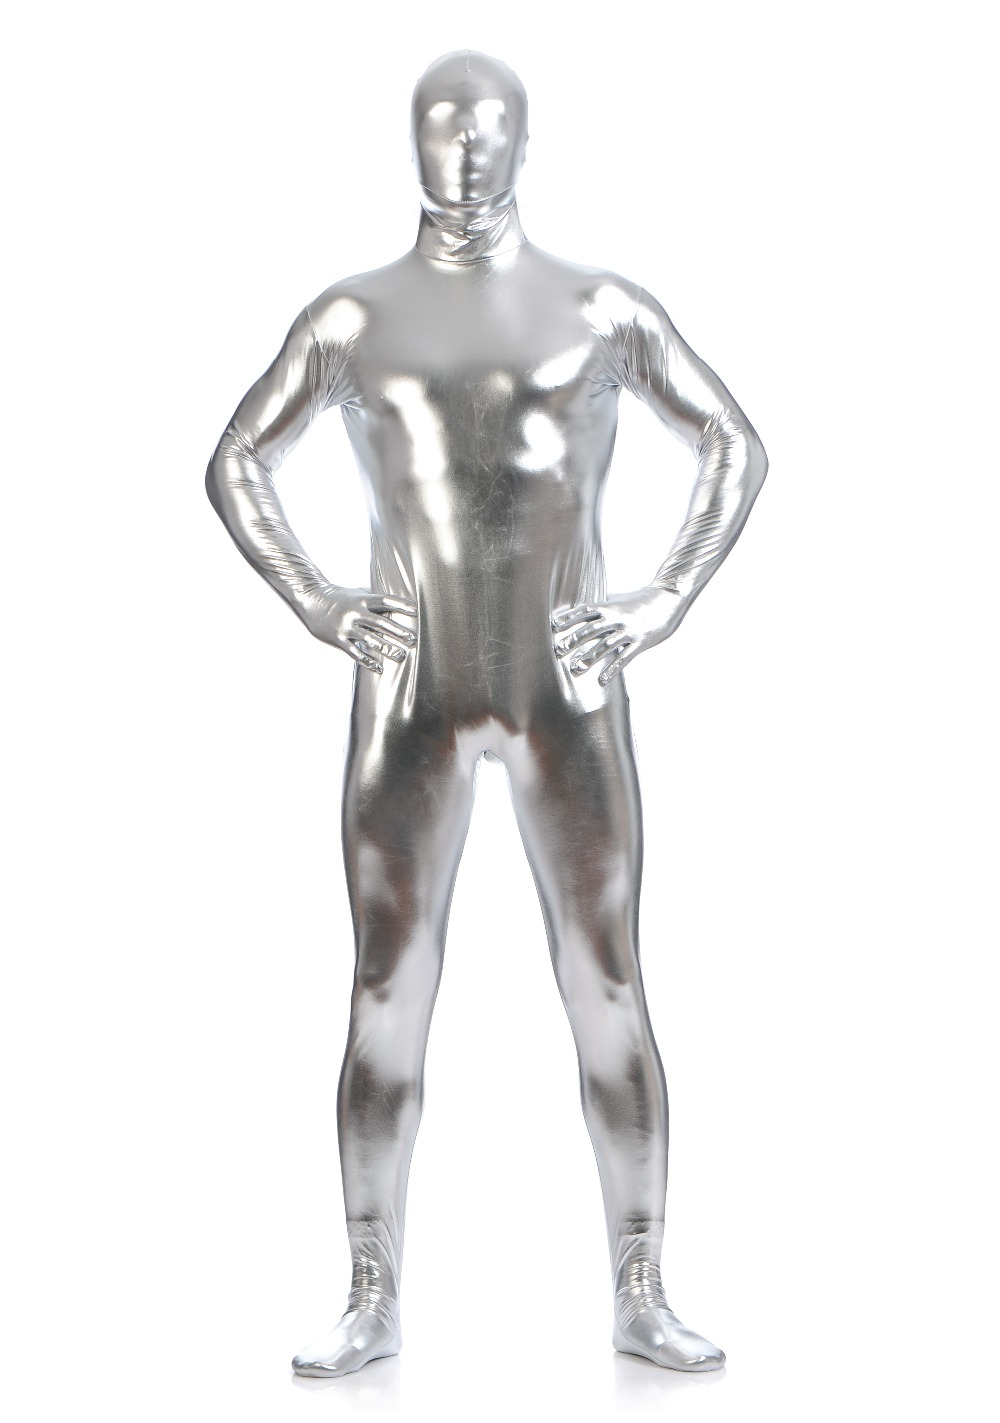 Mandy Wholesale Full Body Shiny Bodysuit Silver Mens Plus Size Spandex Metallic Zentai Suit Lycra Costumes